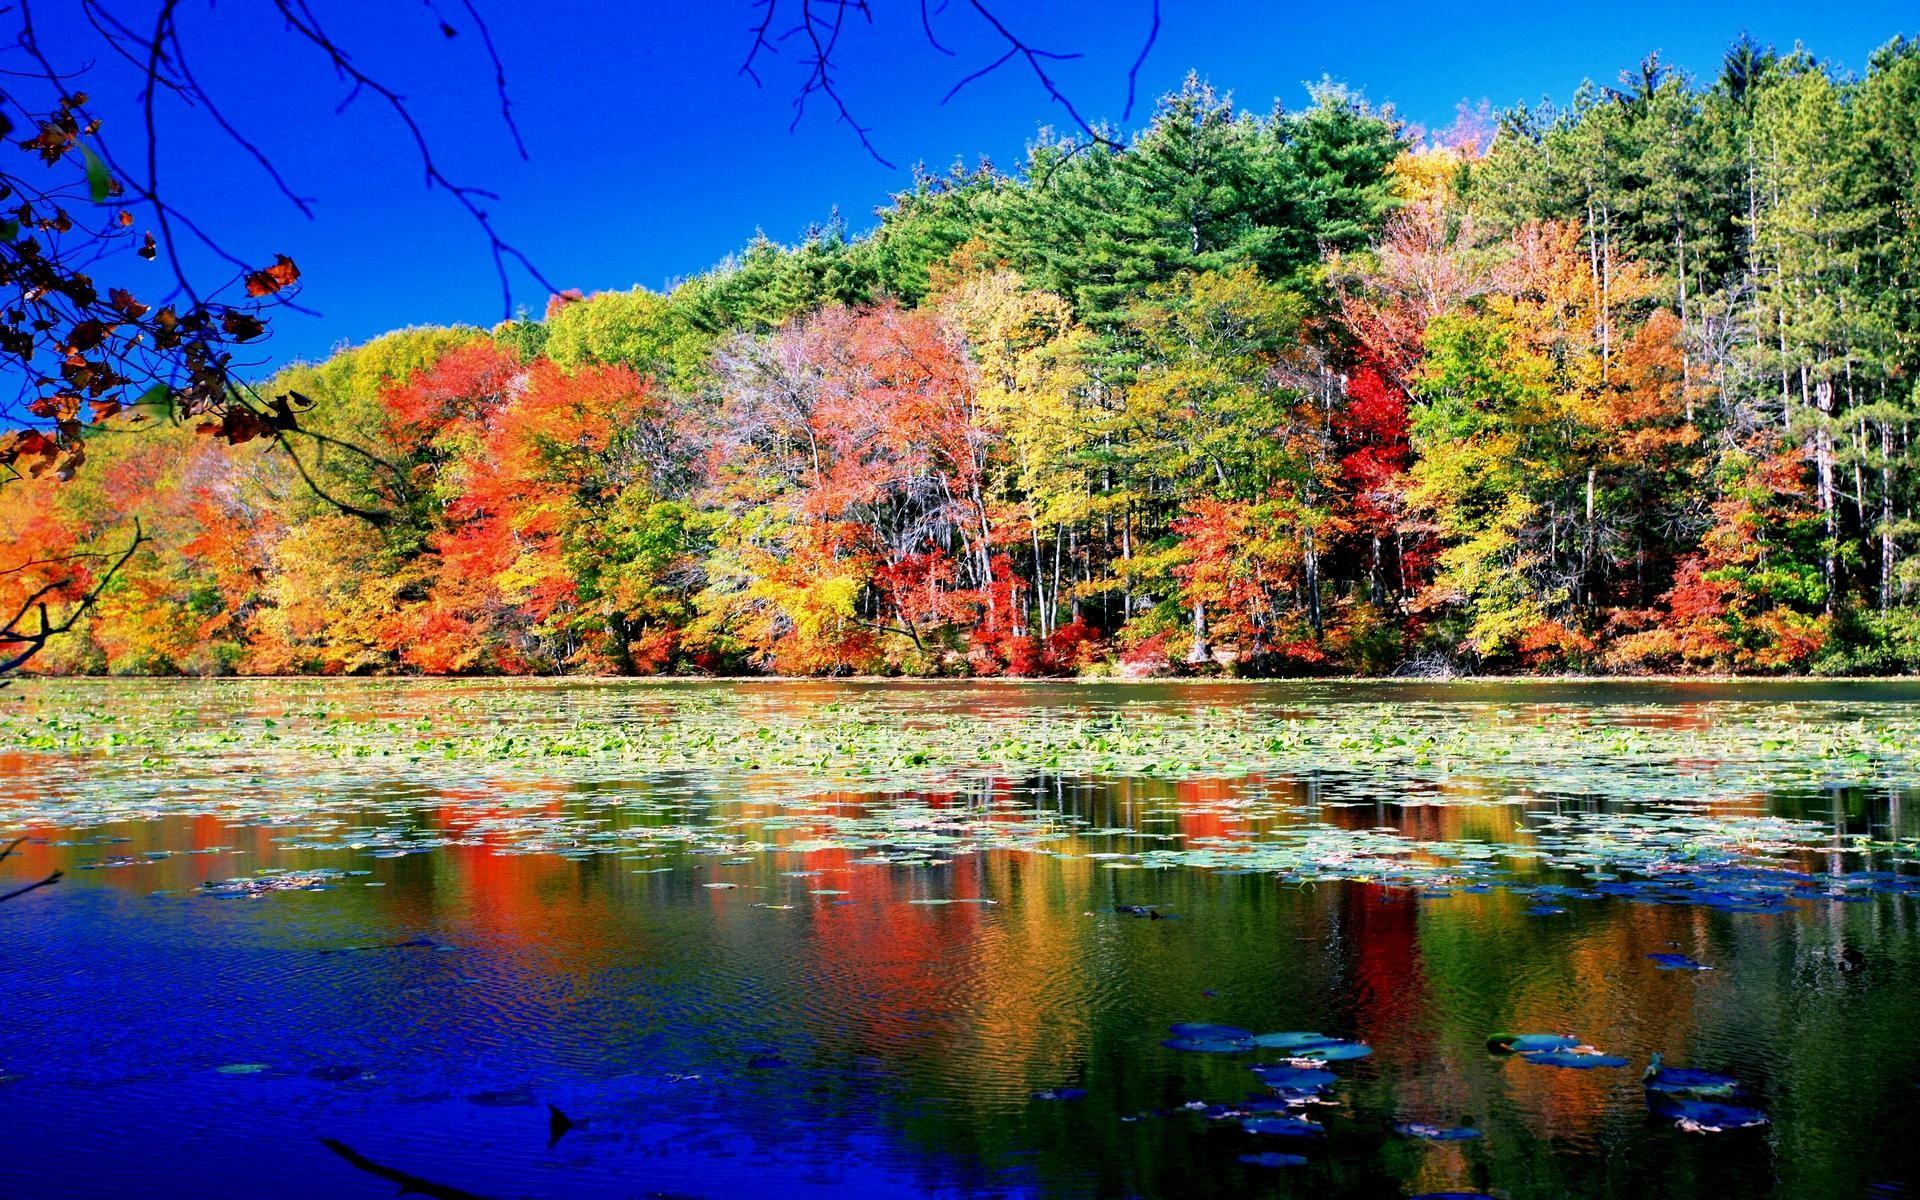 Colourful Autumn Beauty Wallpaper